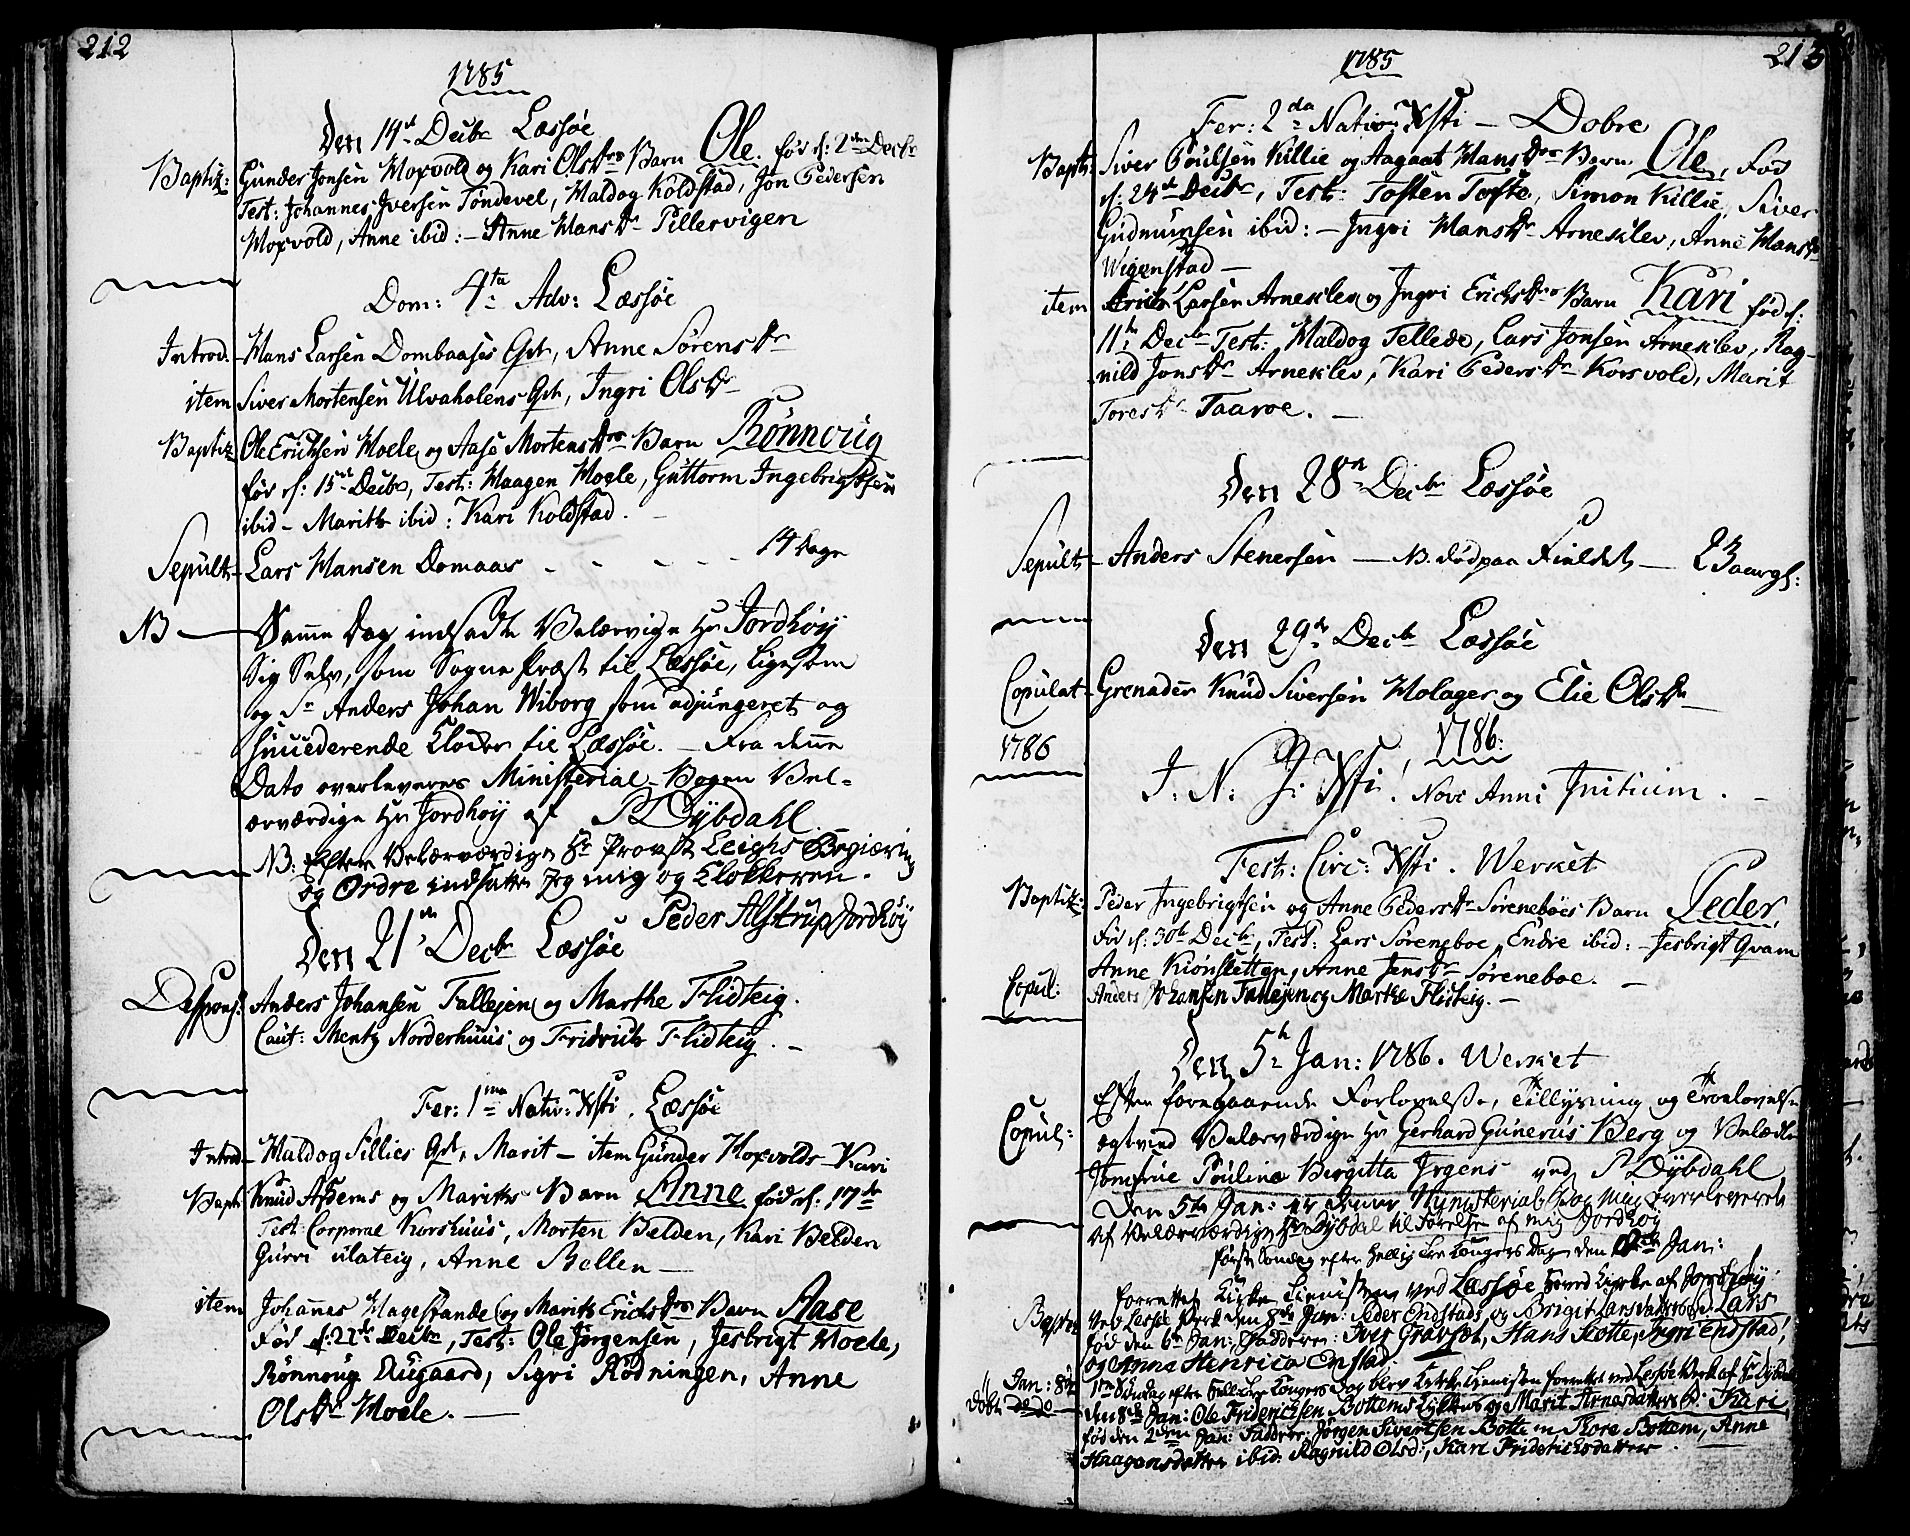 SAH, Lesja prestekontor, Ministerialbok nr. 3, 1777-1819, s. 212-213